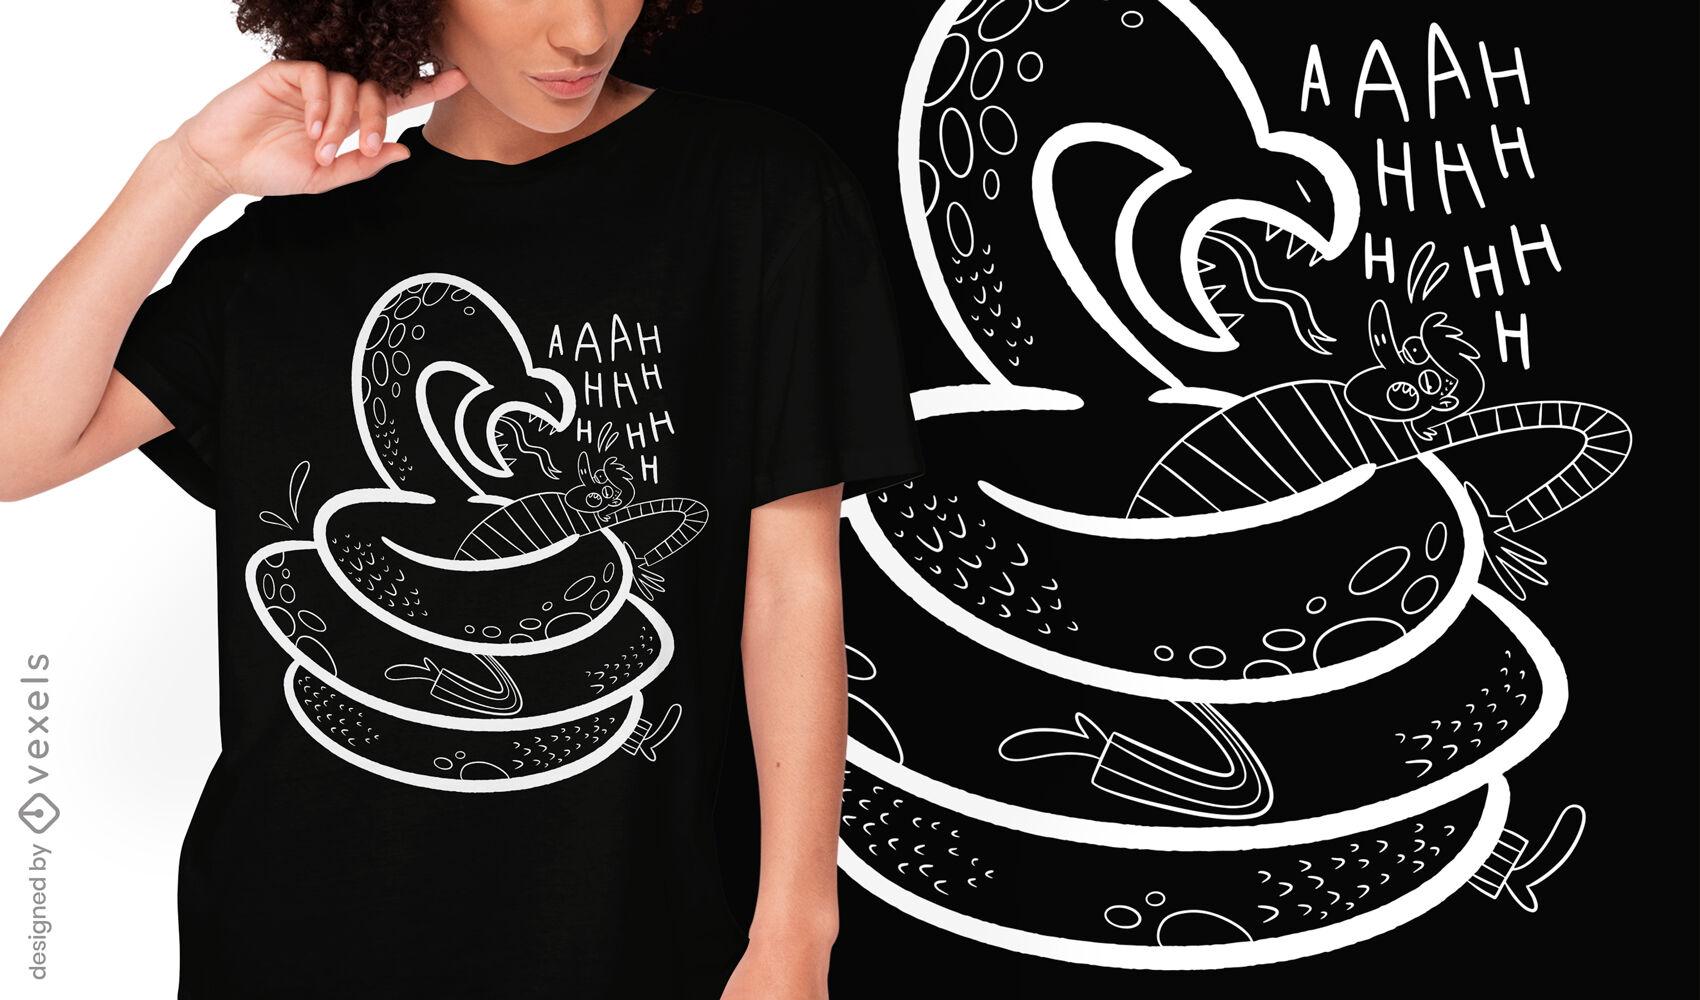 Medo de cobras doodle design de camiseta